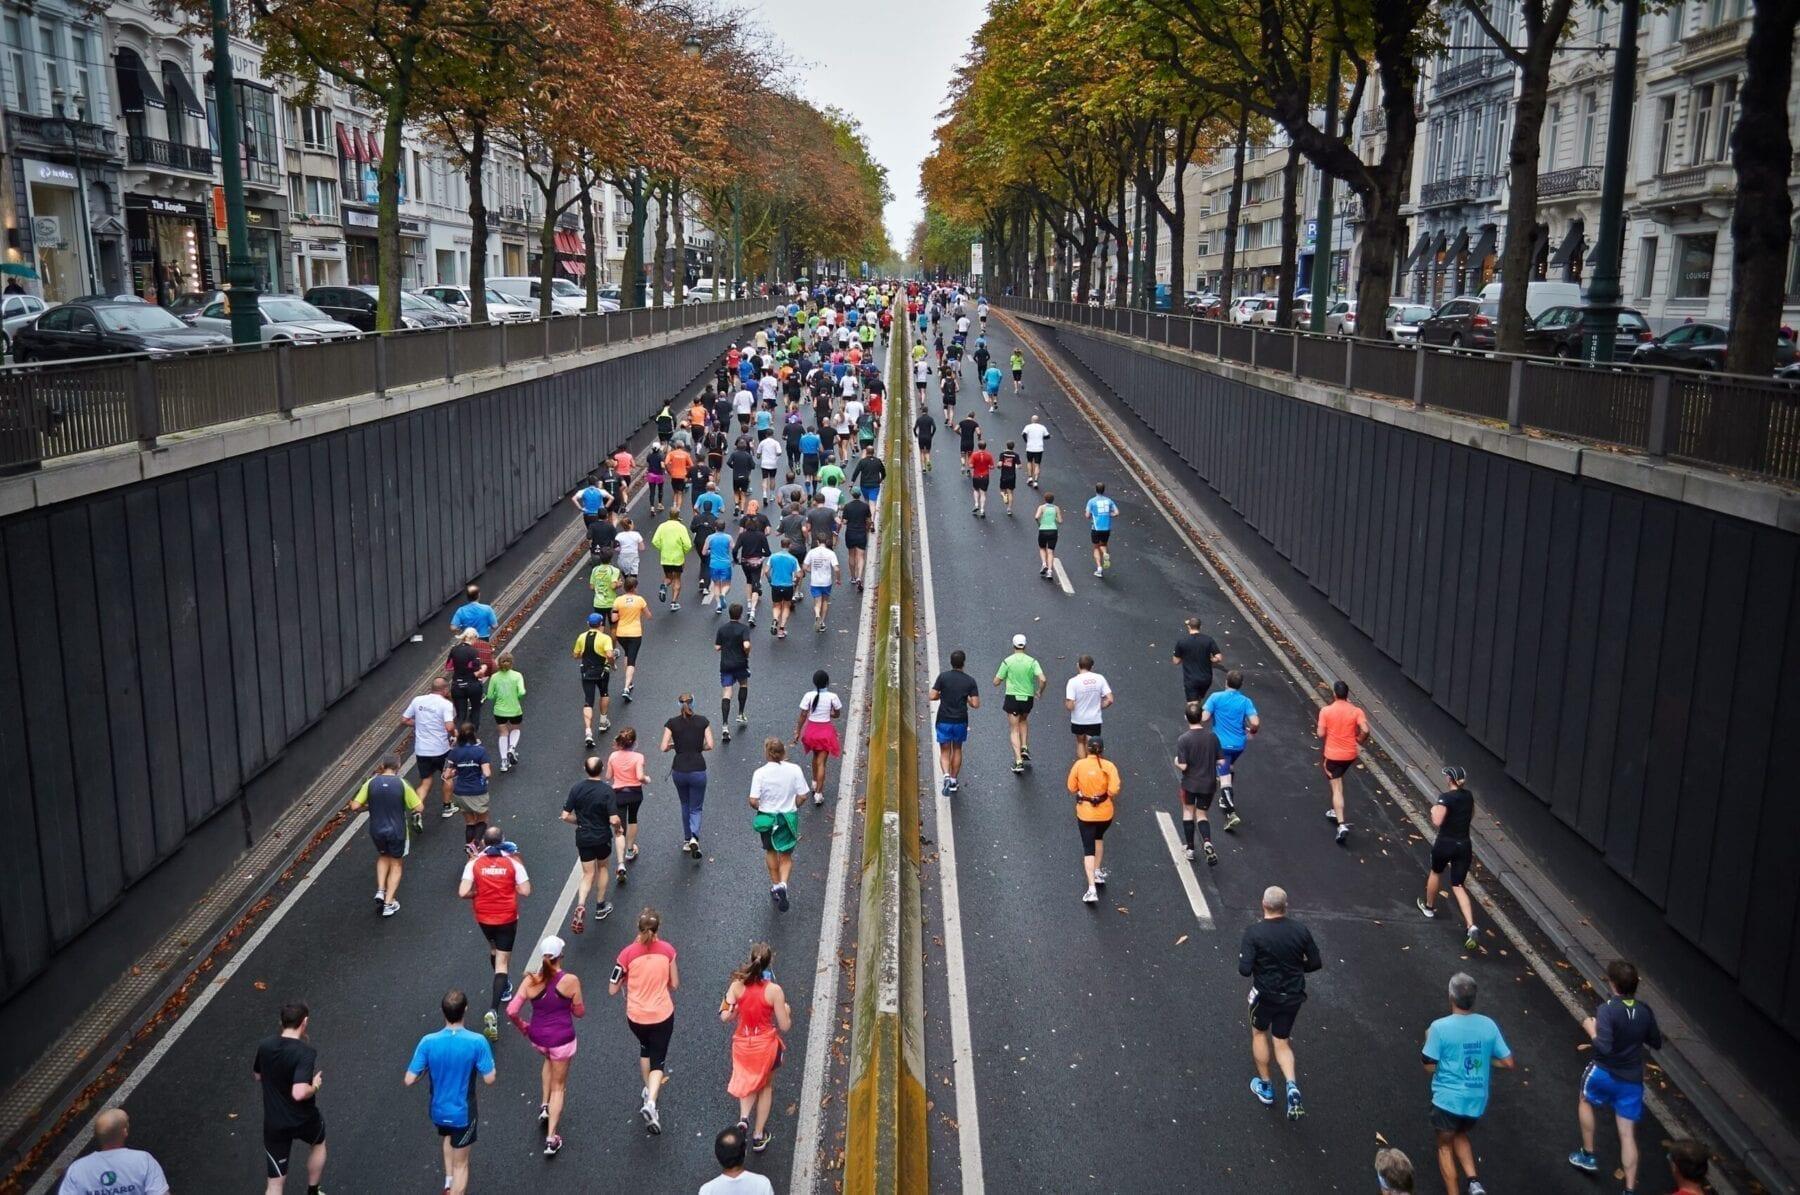 People running along street